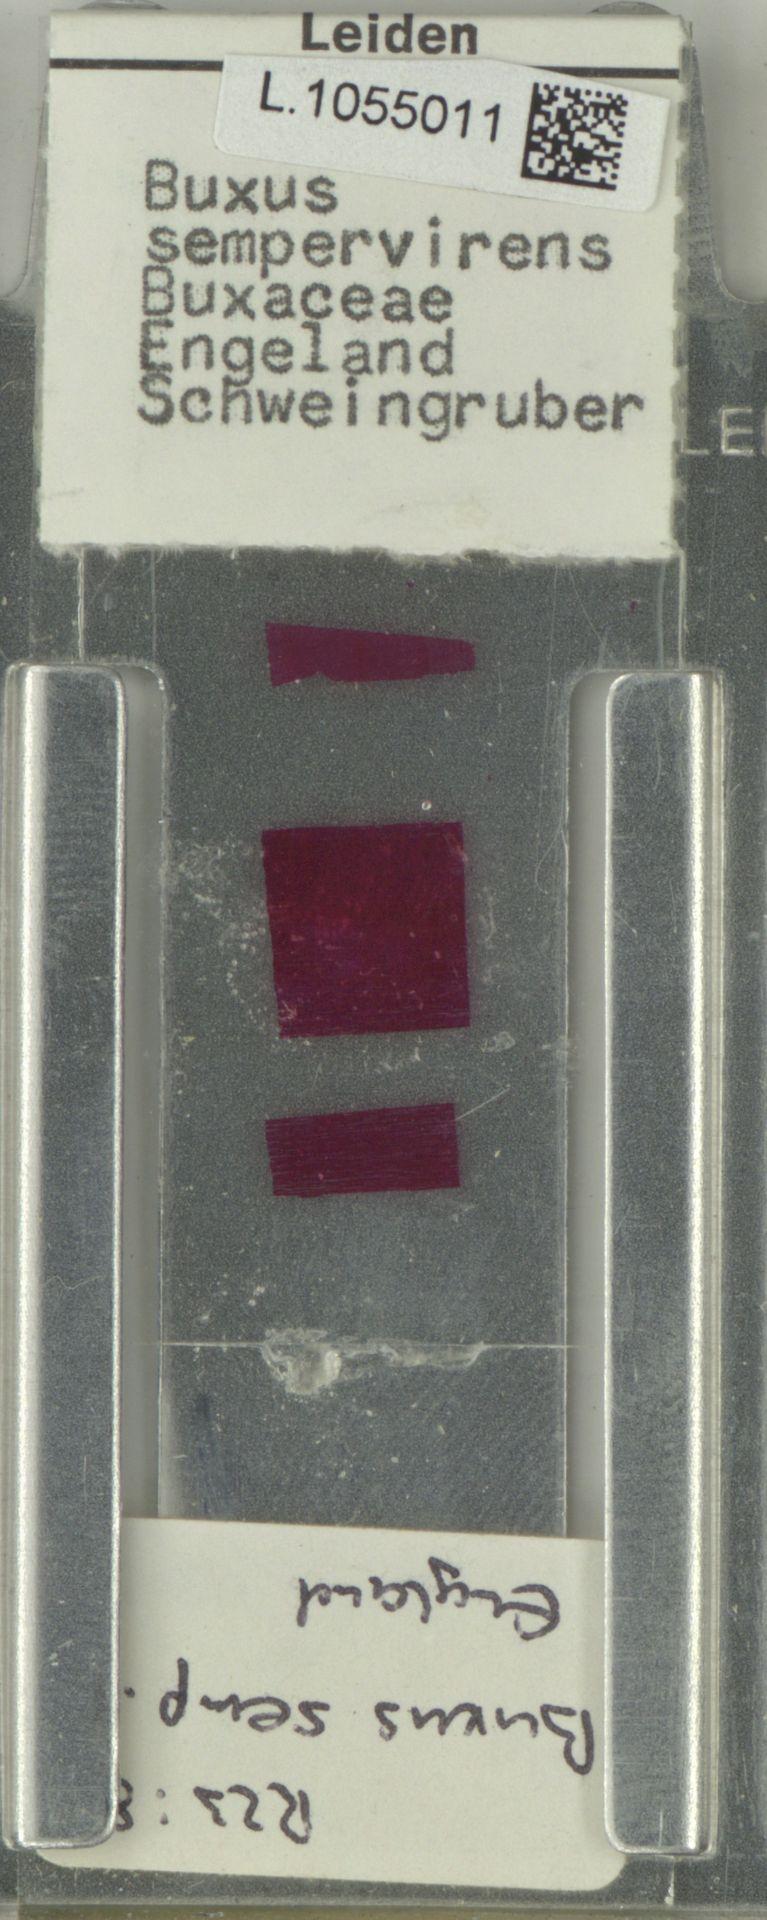 L.1055011 | Buxus sempervirens L.